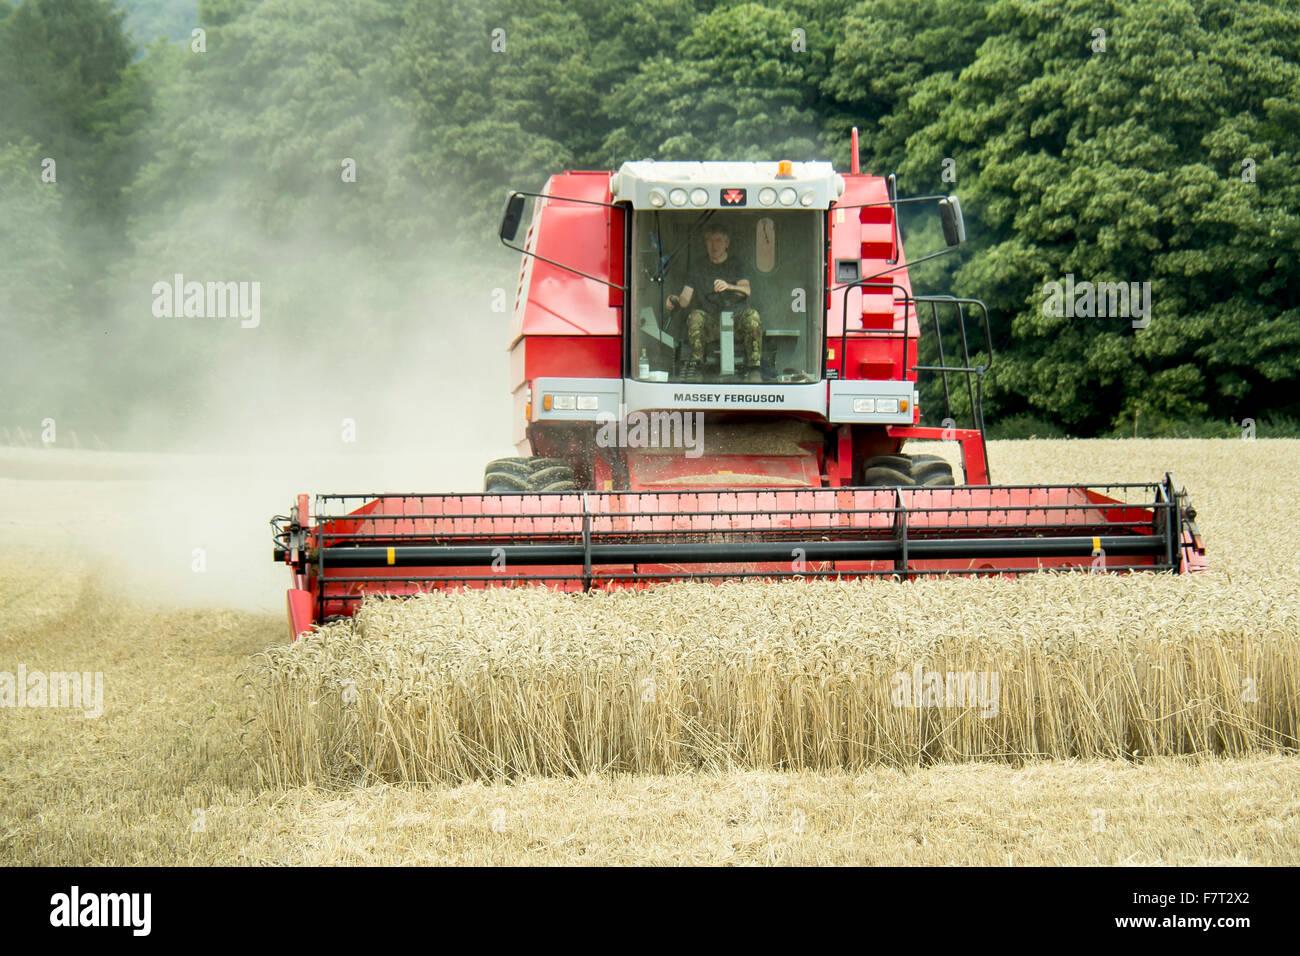 Combined Harvestor Harvesting Wheat, North Yorkshire, England - Stock Image